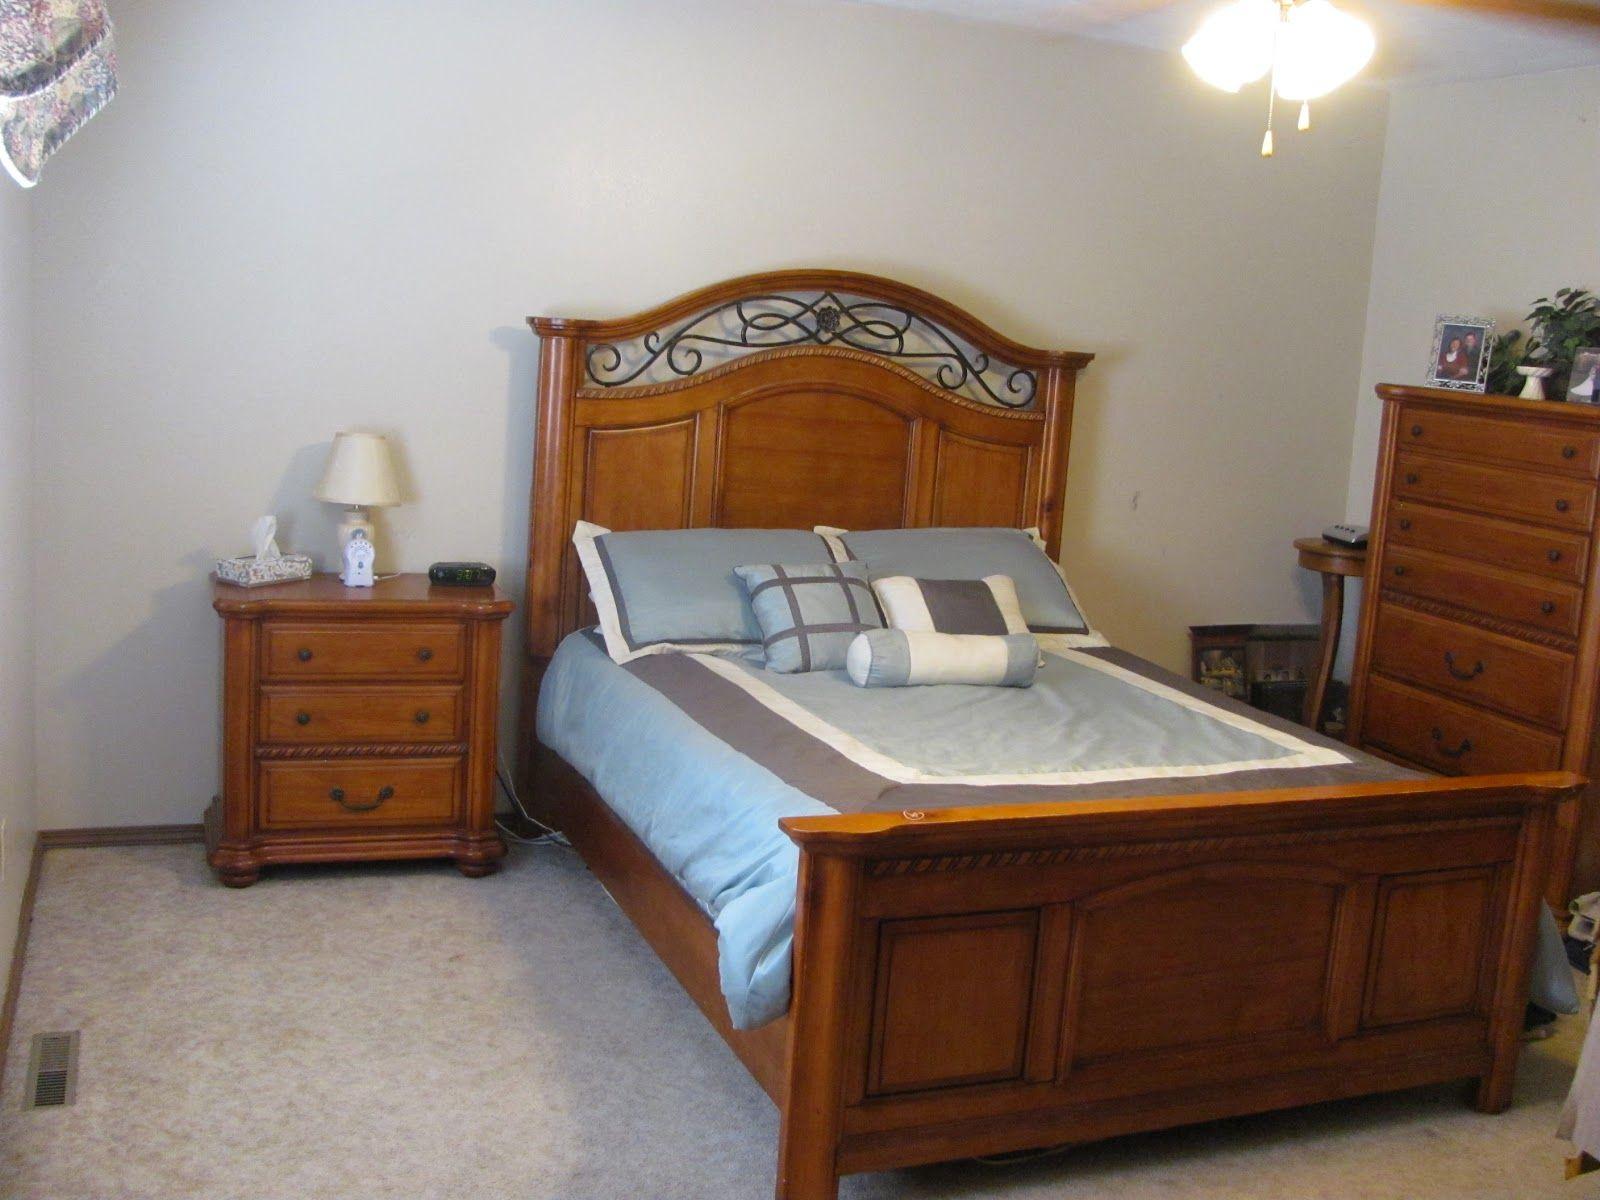 Normal Bedroom Designs glamorous normal kids bedroom => https://smsmls/19118/normal